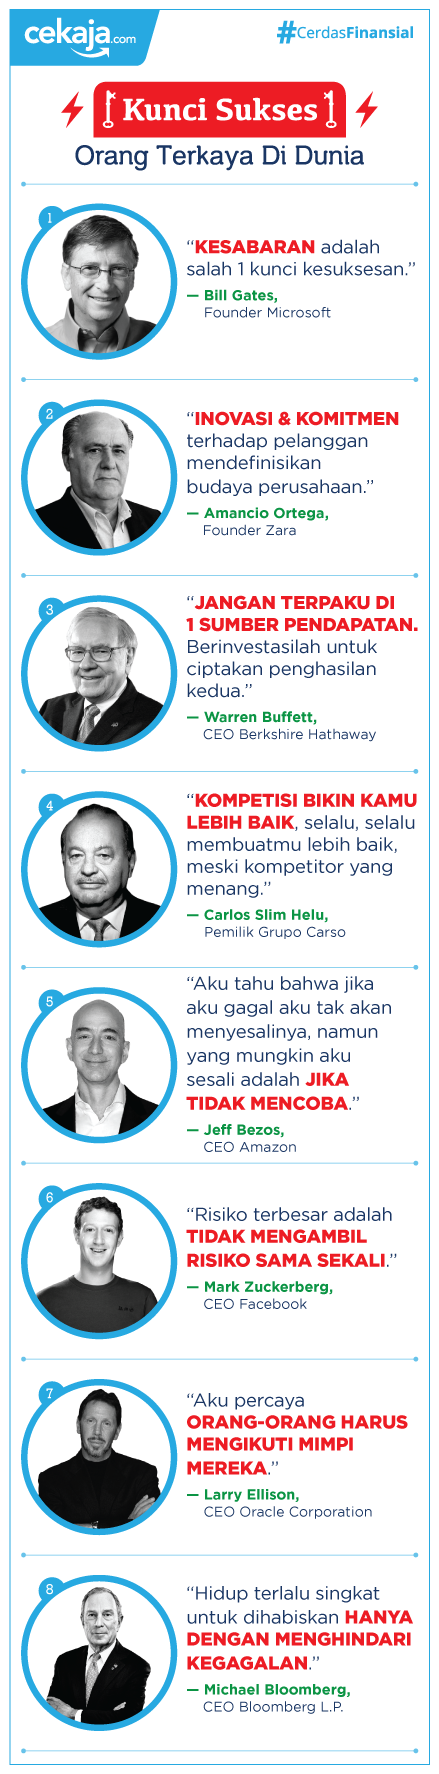 infografis-kunci sukses miliarder - CekAja.com